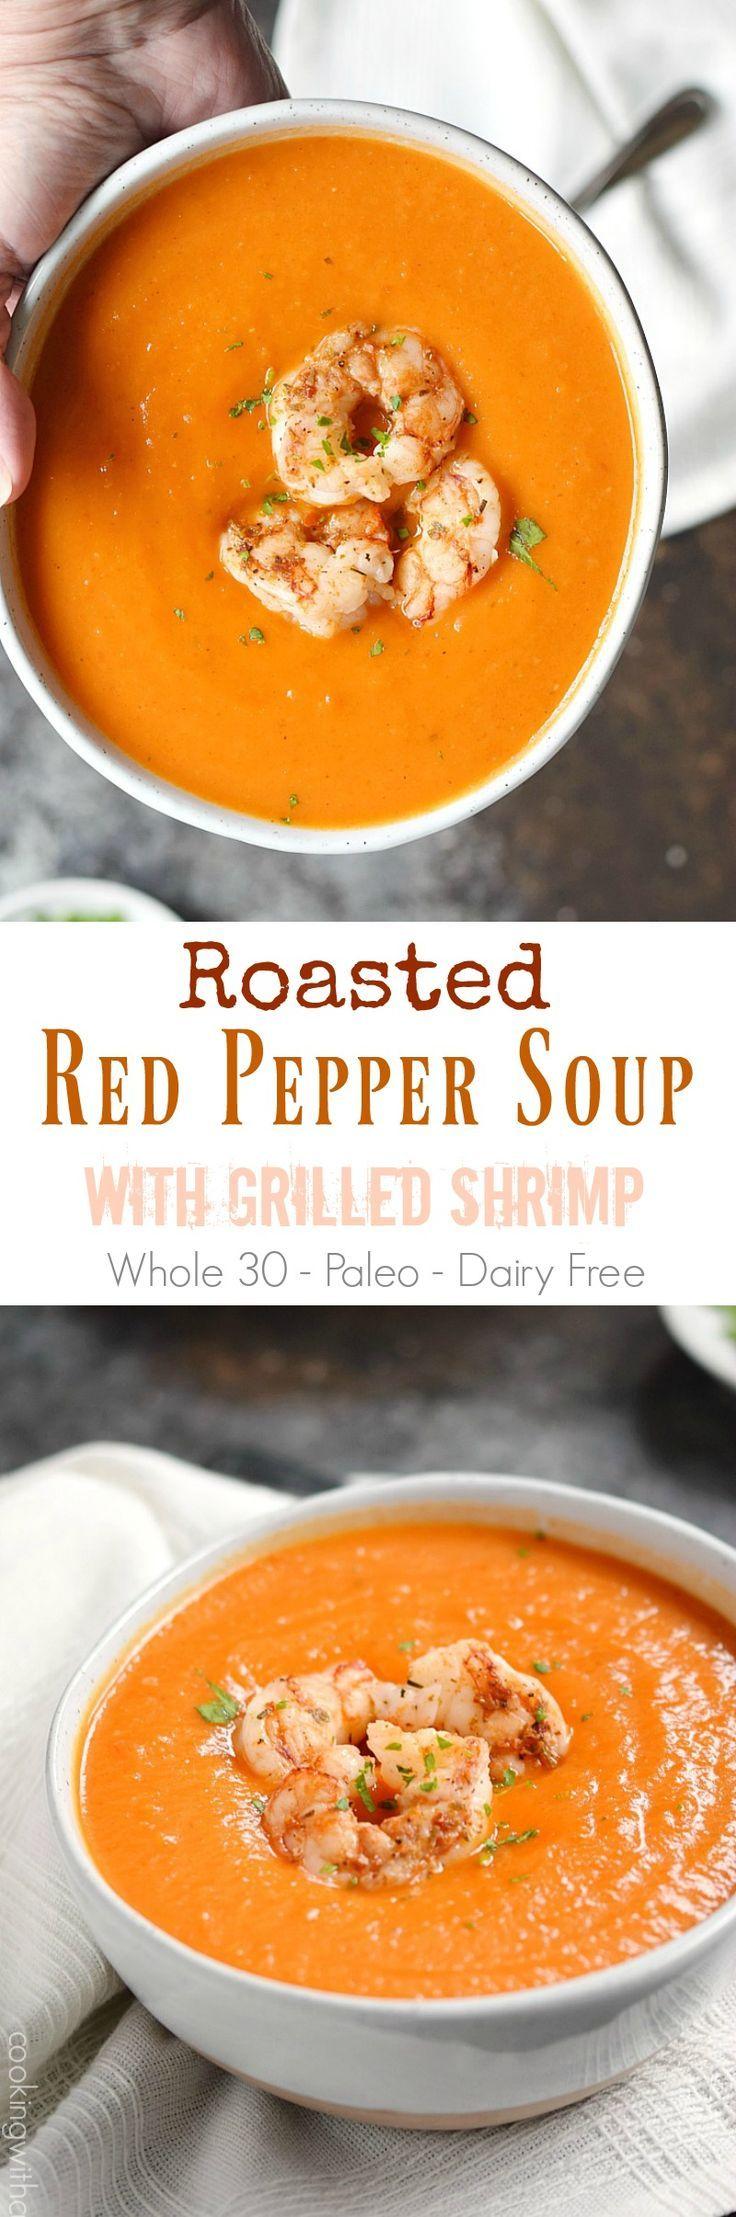 10+ ideas about Grilled Shrimp Salads on Pinterest ...